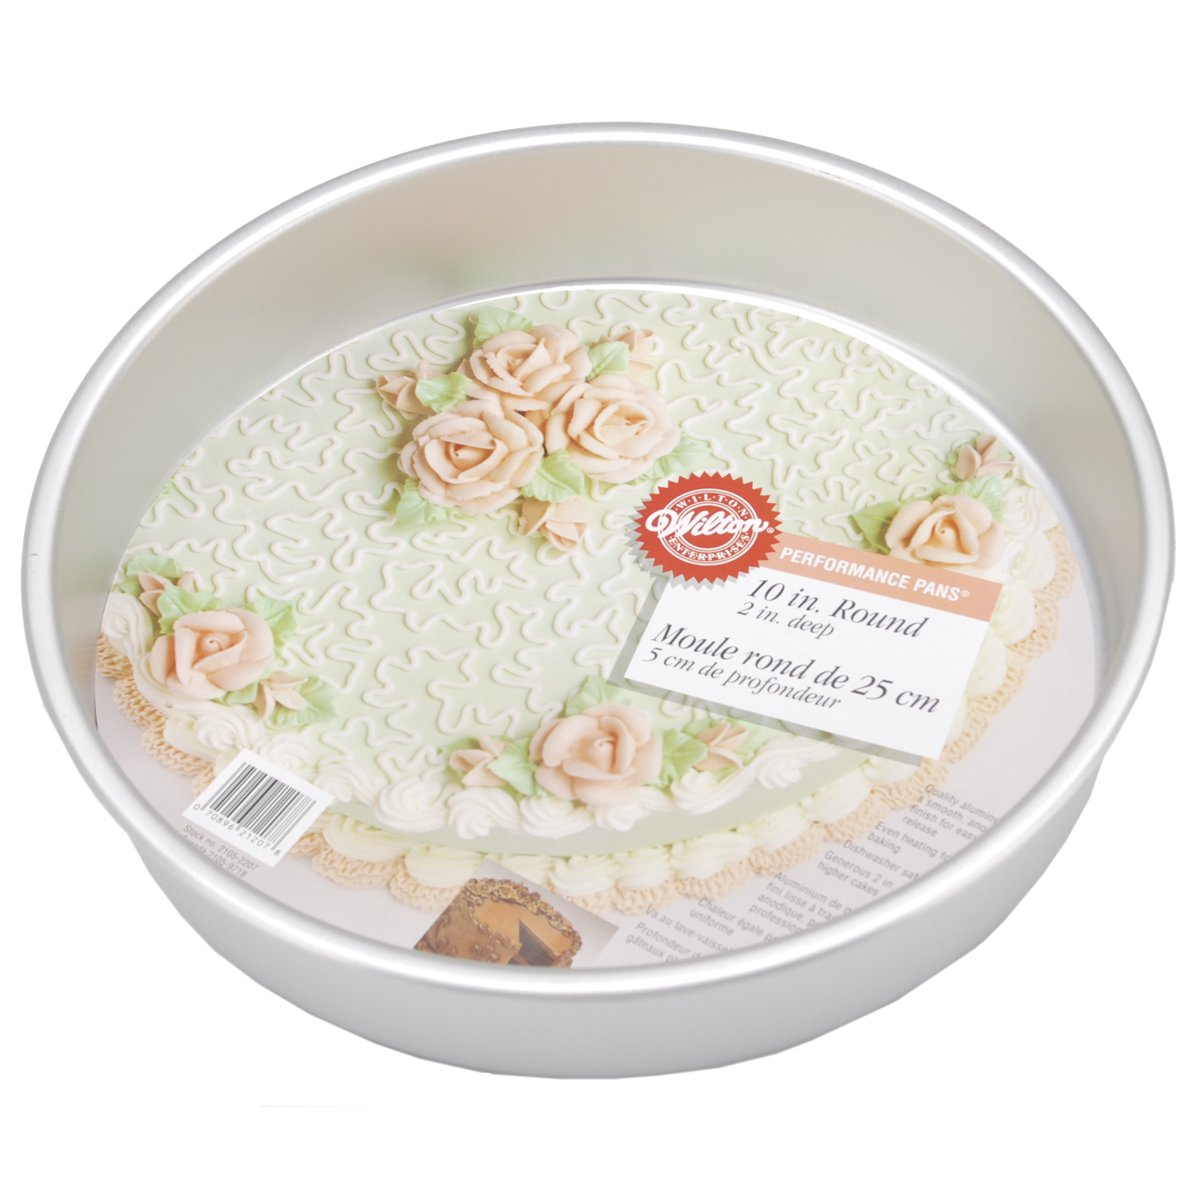 Wilton 2105-2207 Performance Aluminum Cake, 10-Inch PERF PAN 10X2 ROUND,